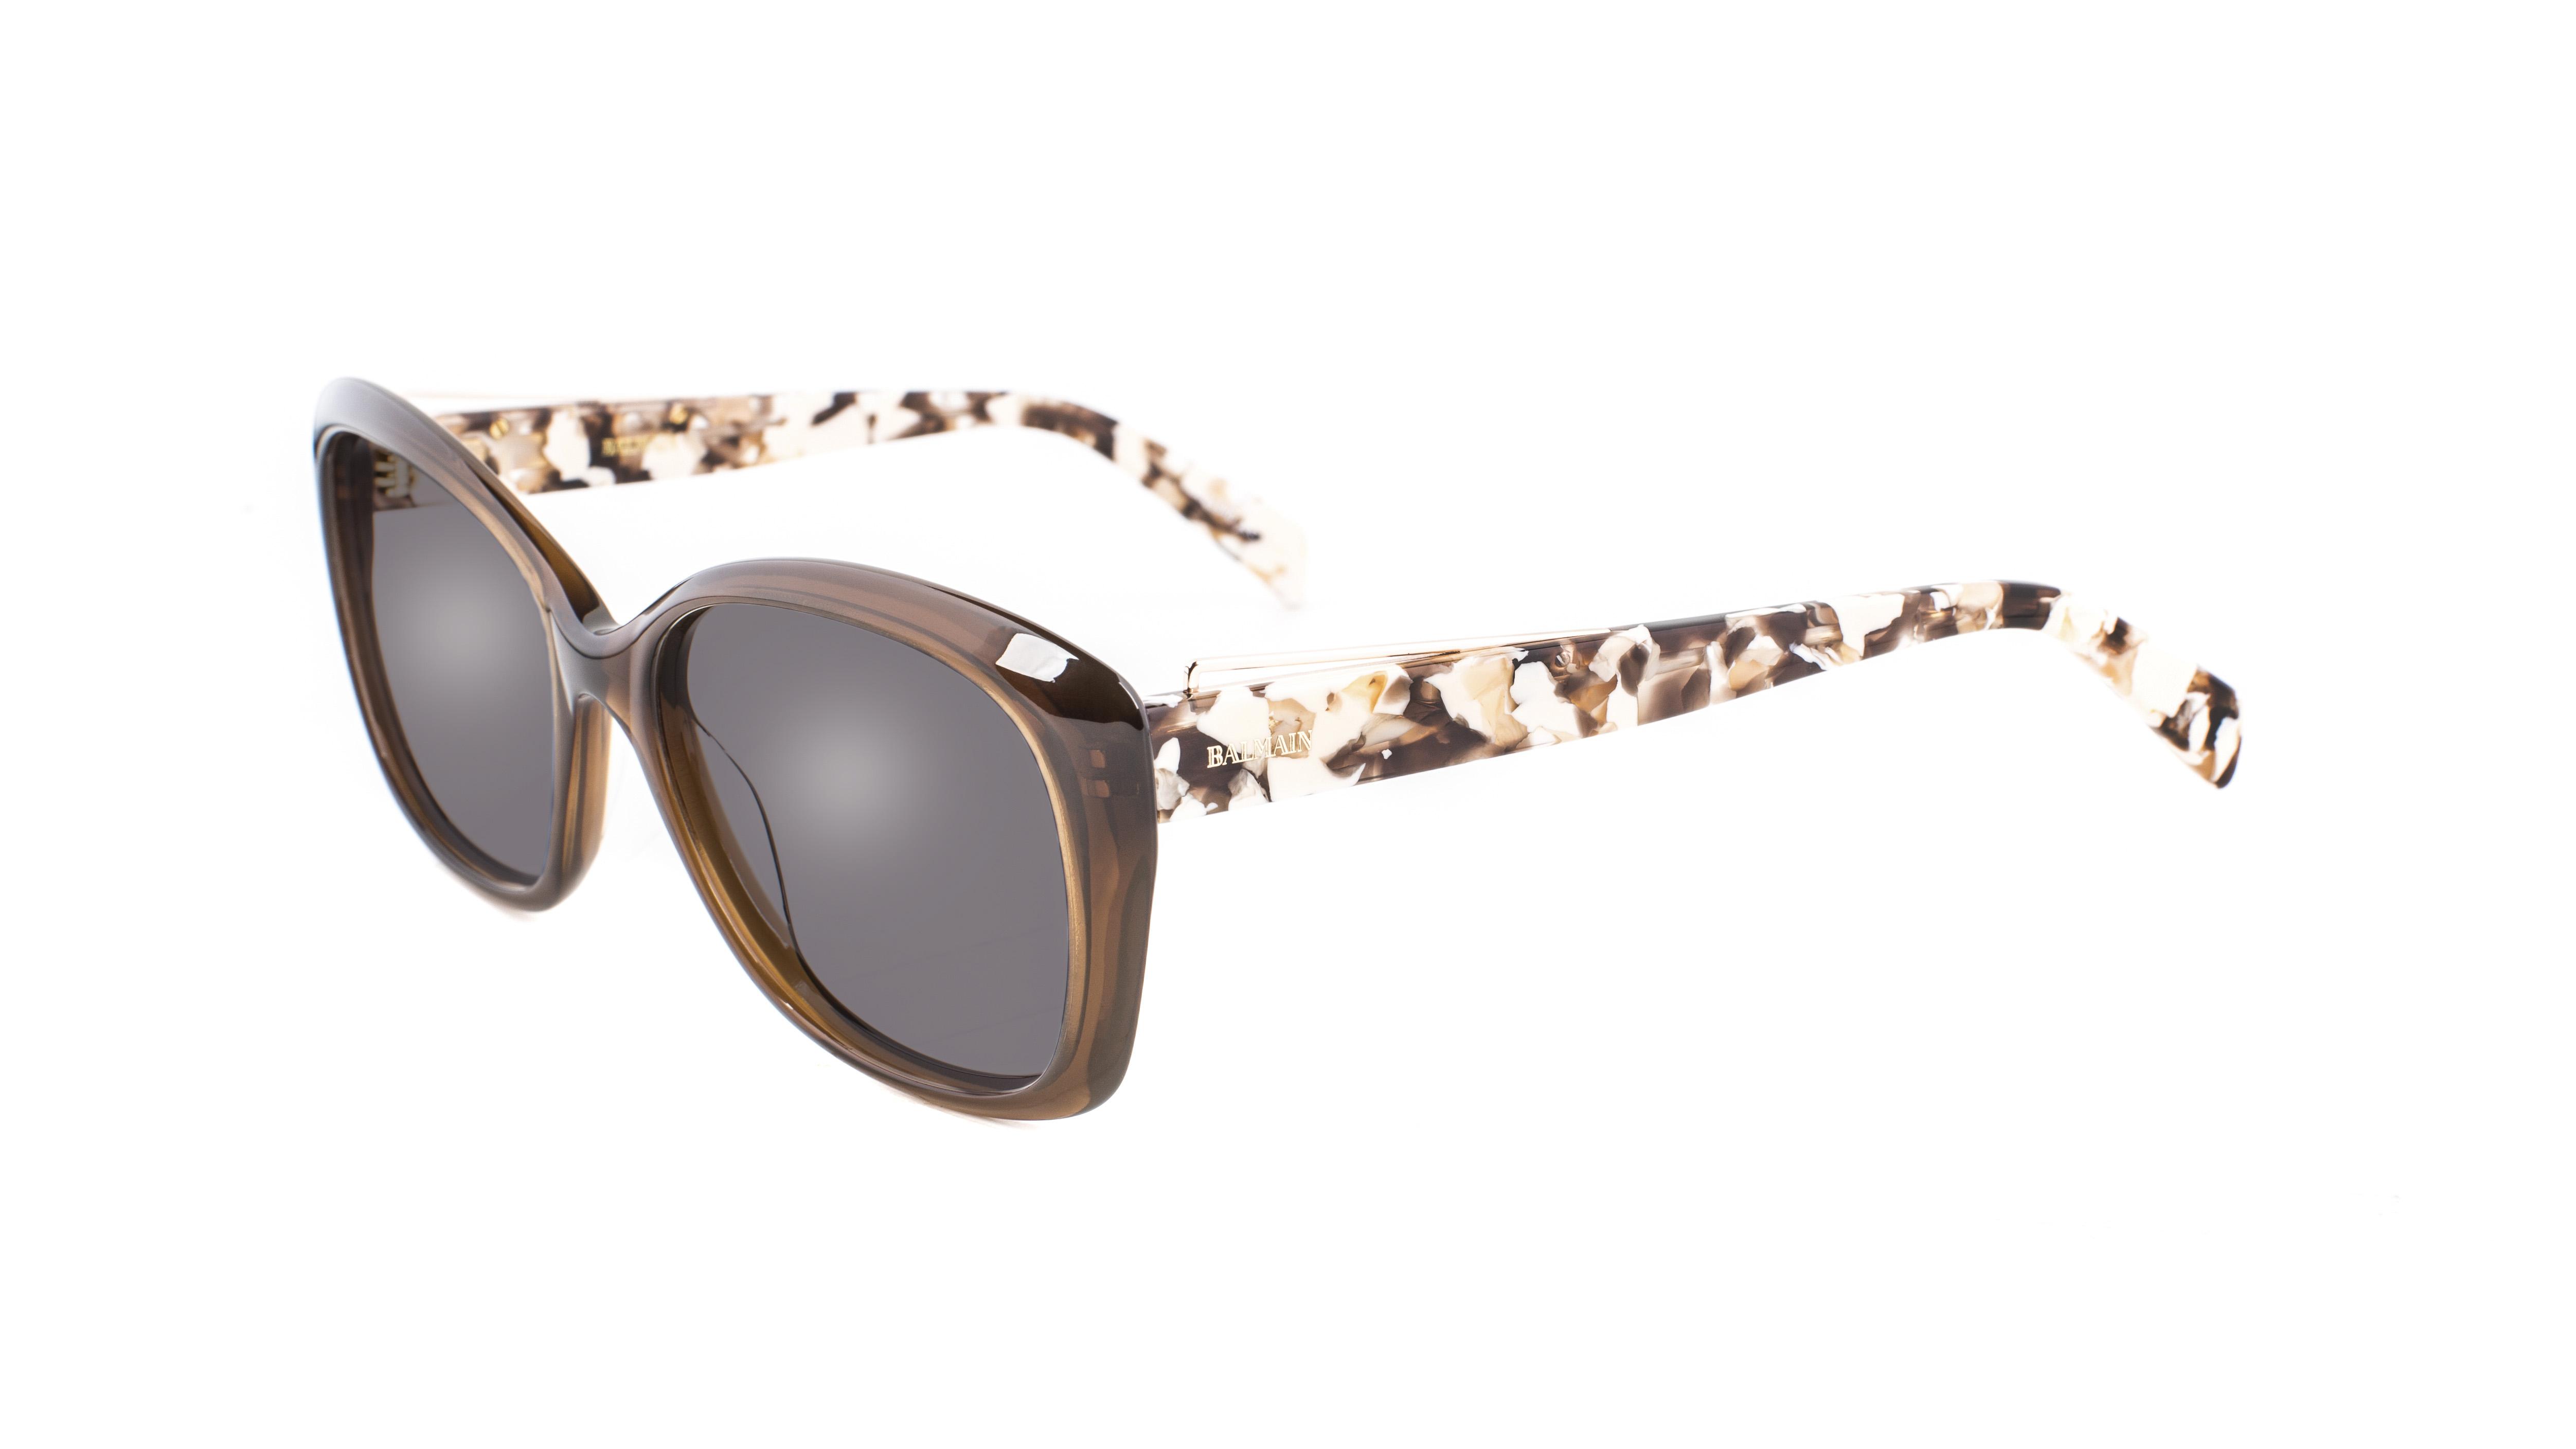 Balmain x Specsavers BL1526S SUN RX 30570658 - RRP 2 pairs single vision $459 (2)